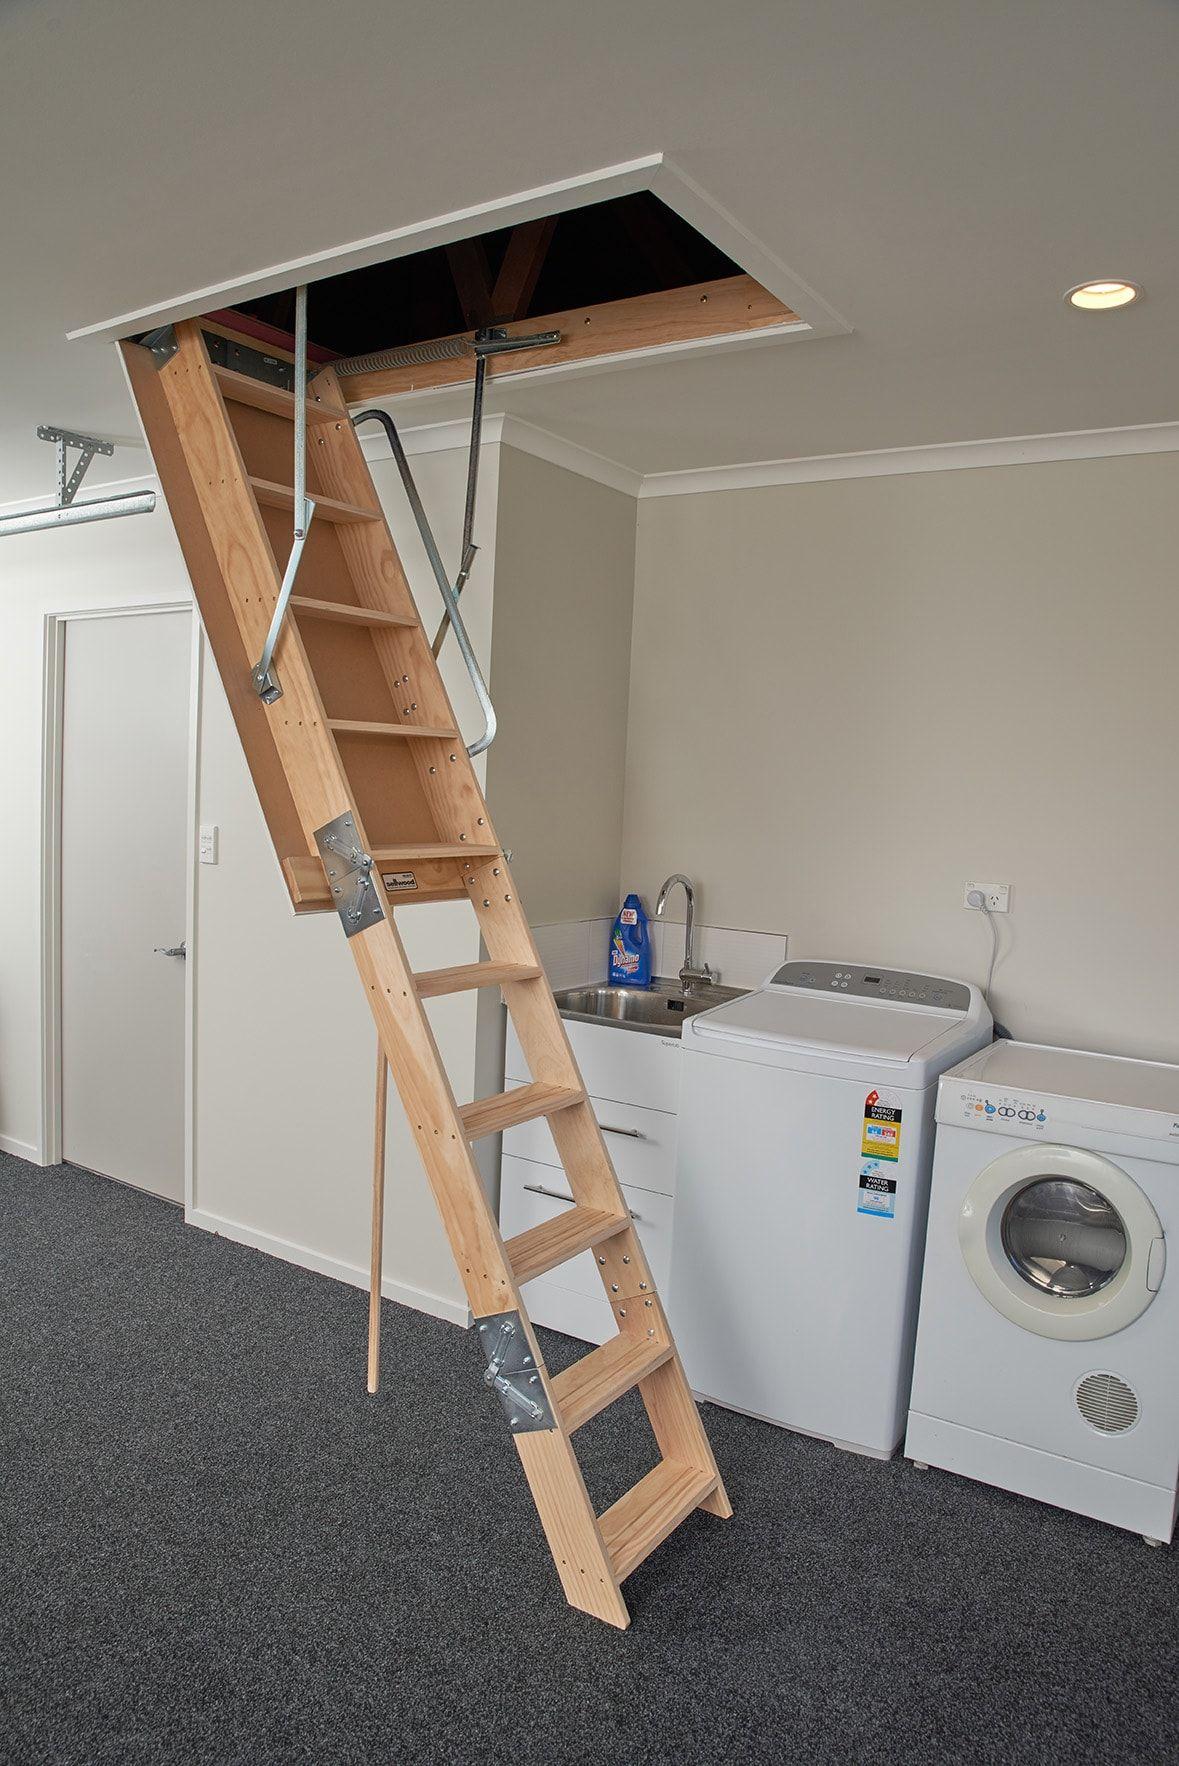 Sellwood Attic Ladder Installation Professional Service Attic Ladder Loft Ladder Loft Hatch And Ladder